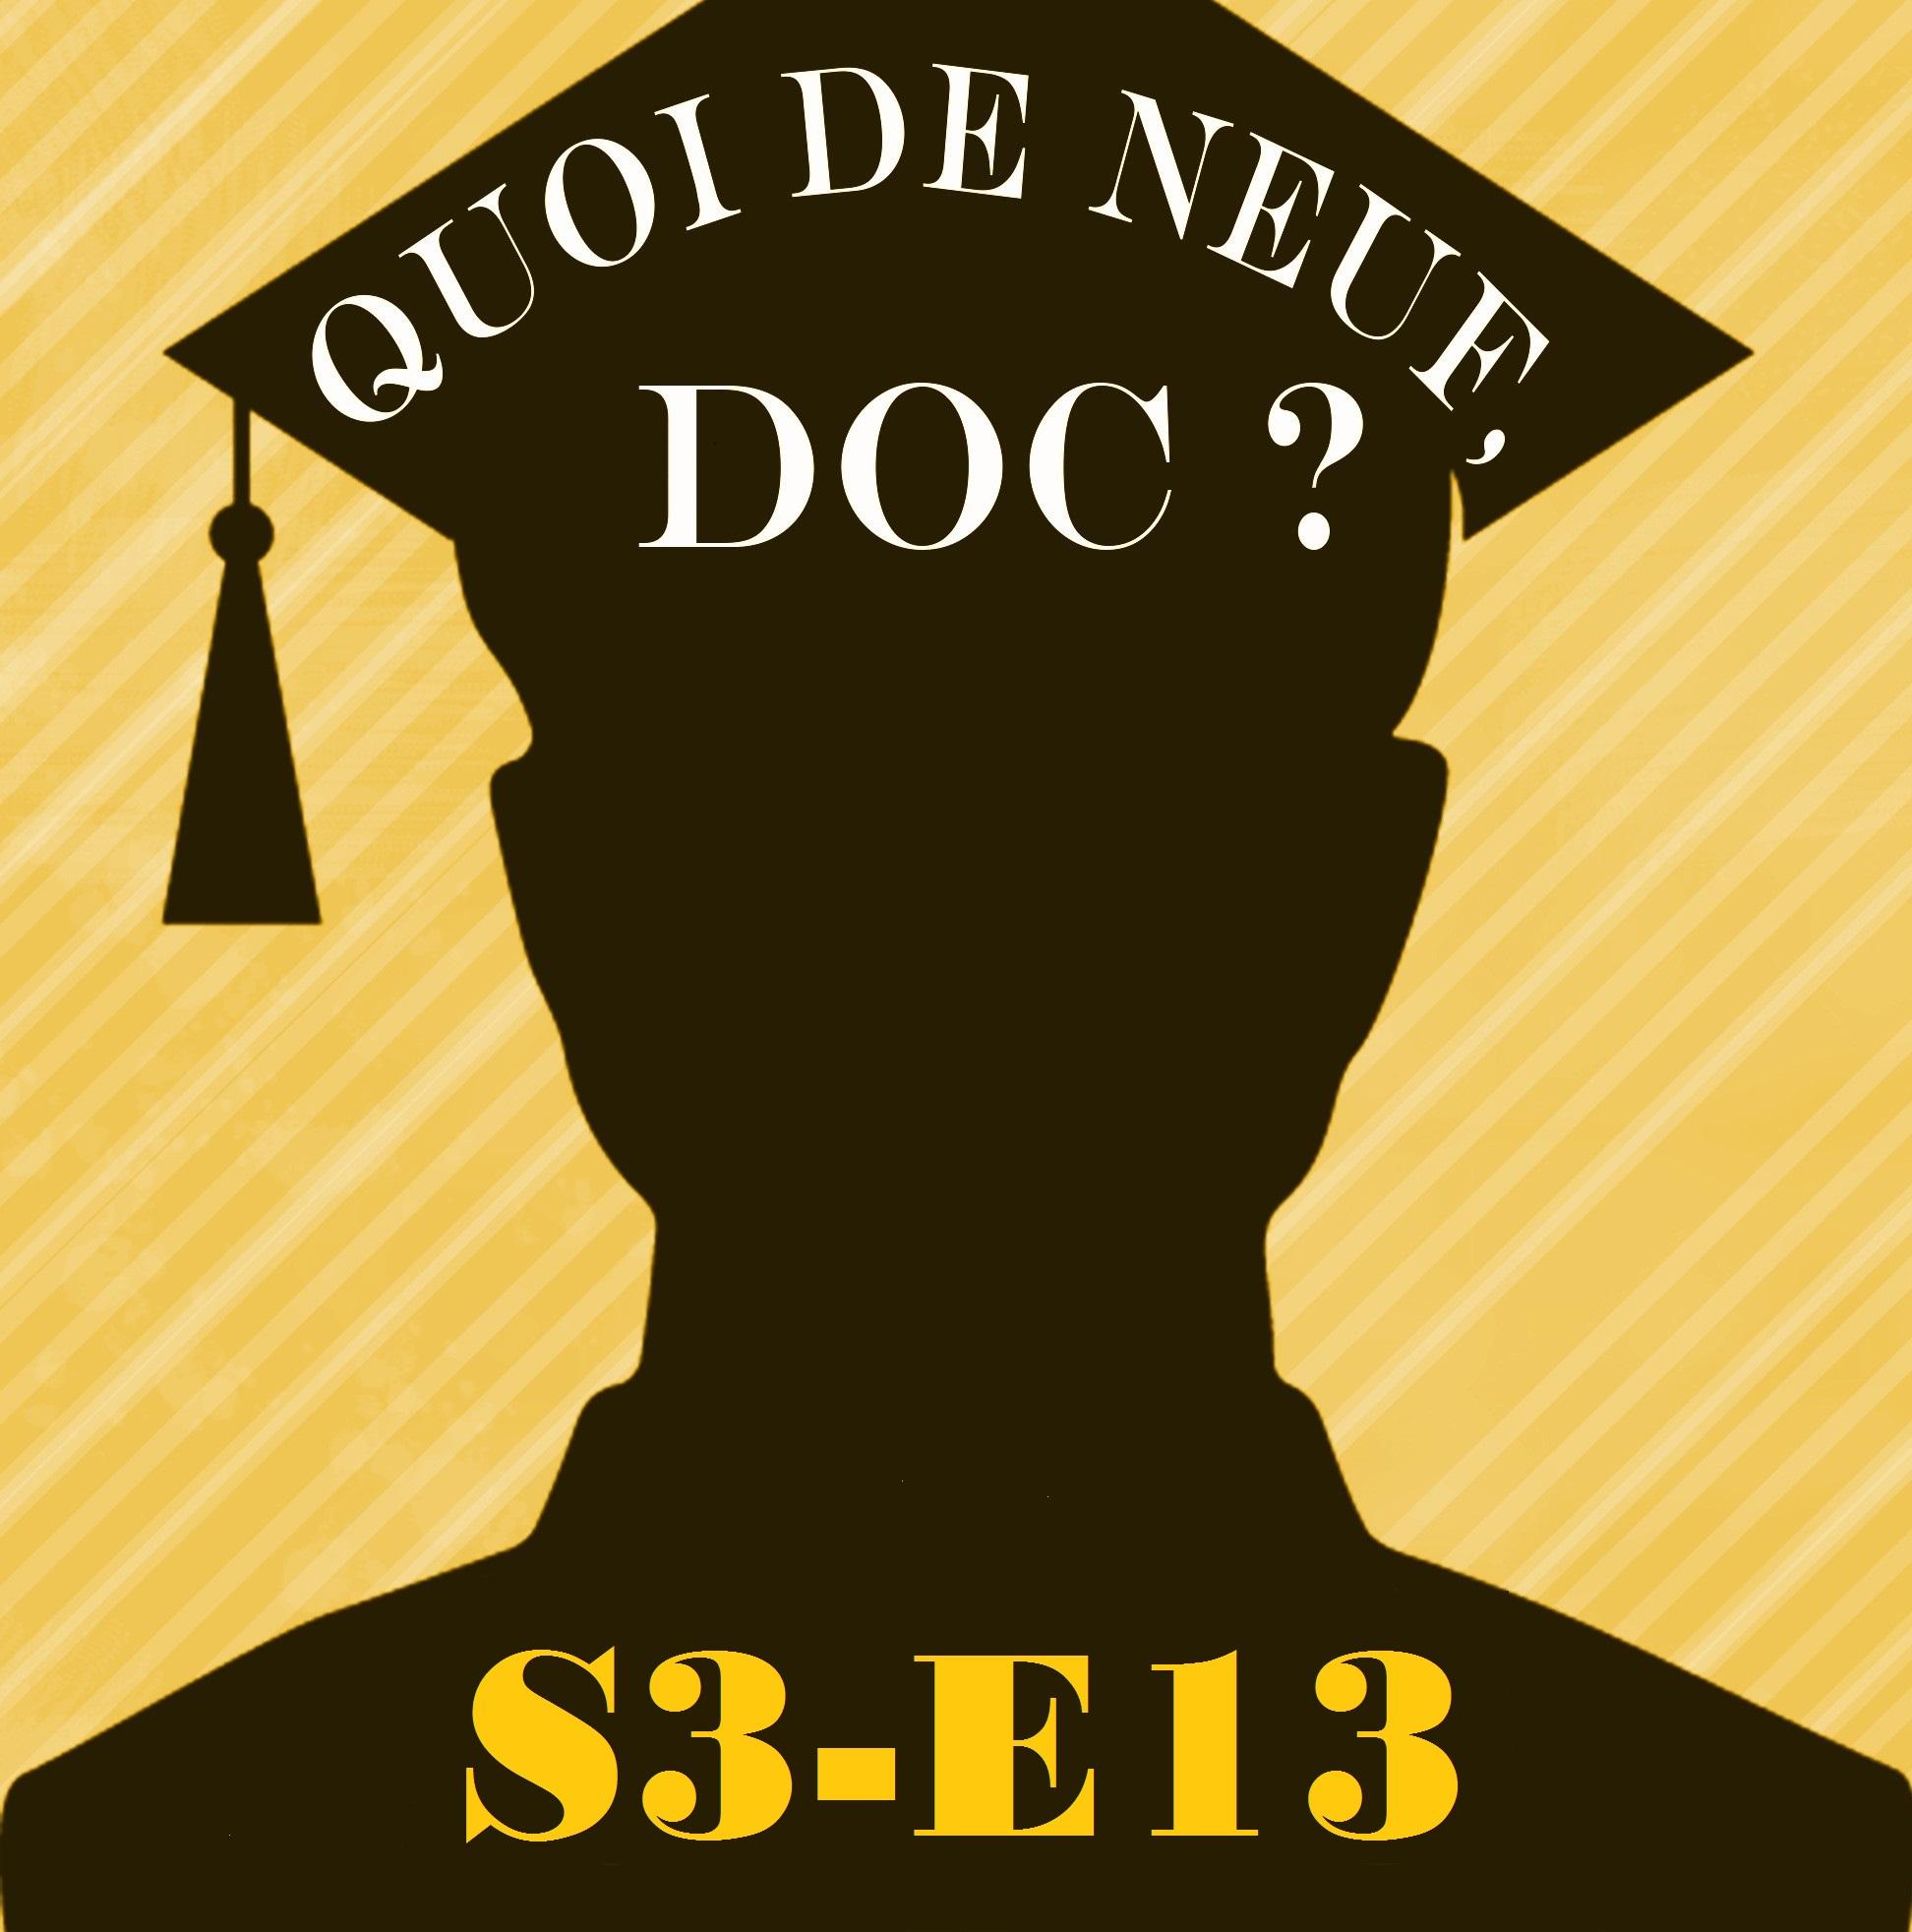 QDND S3E13 Emission du 3 Mai